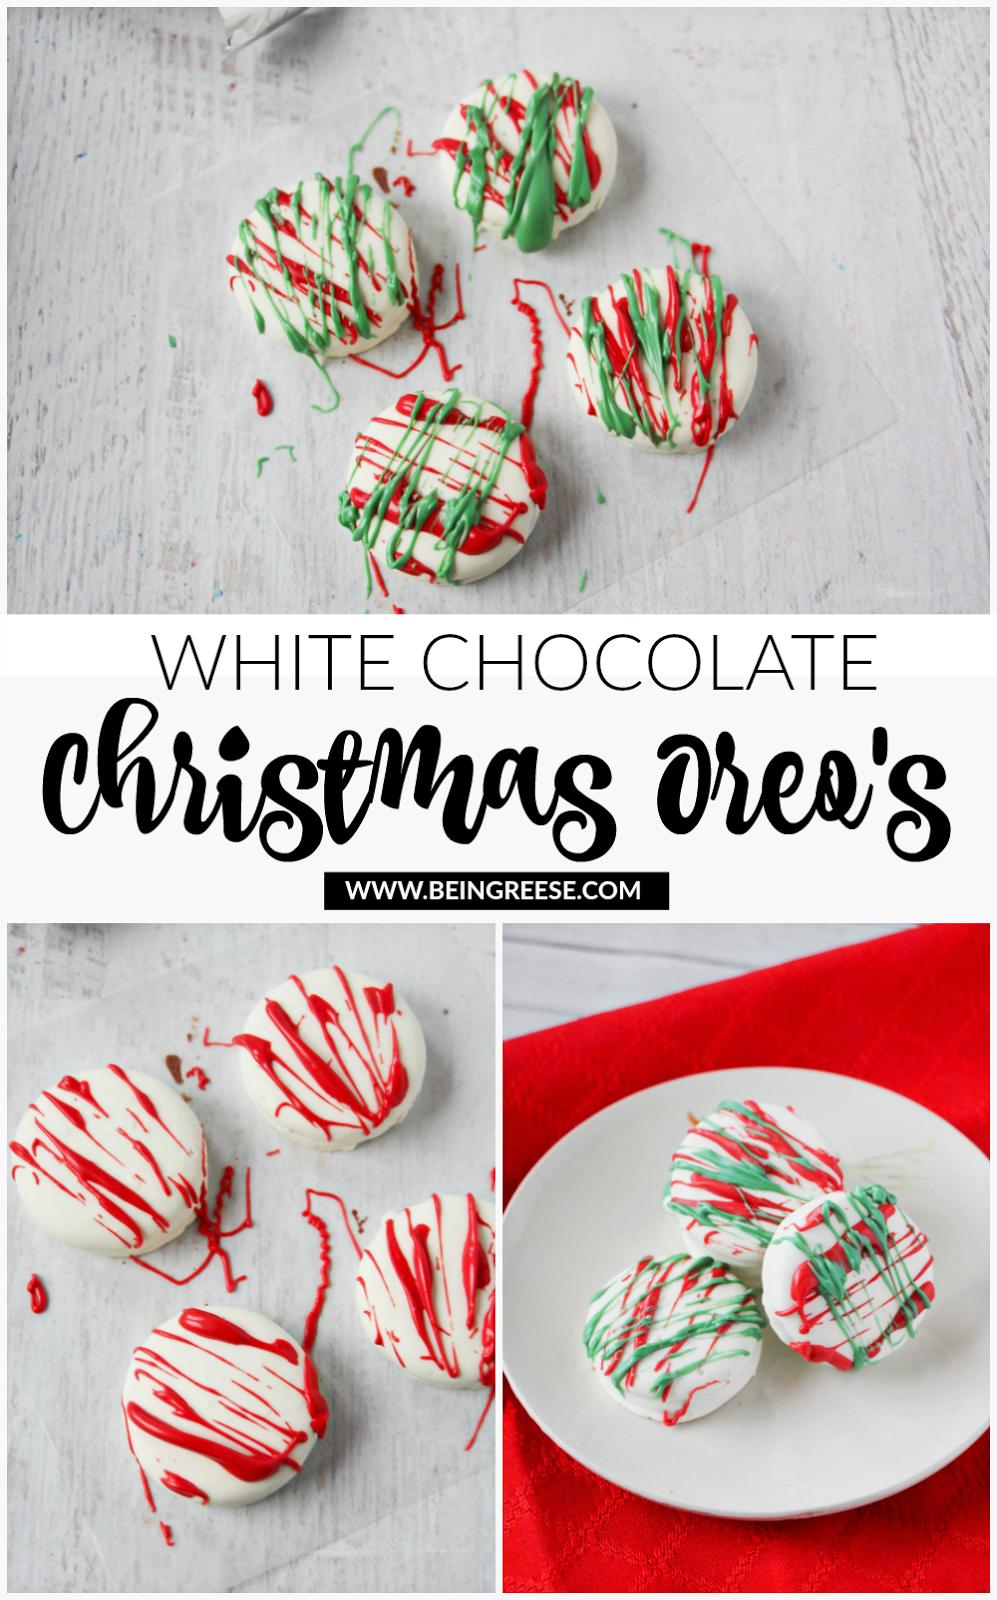 White Chocolate Christmas Oreo S